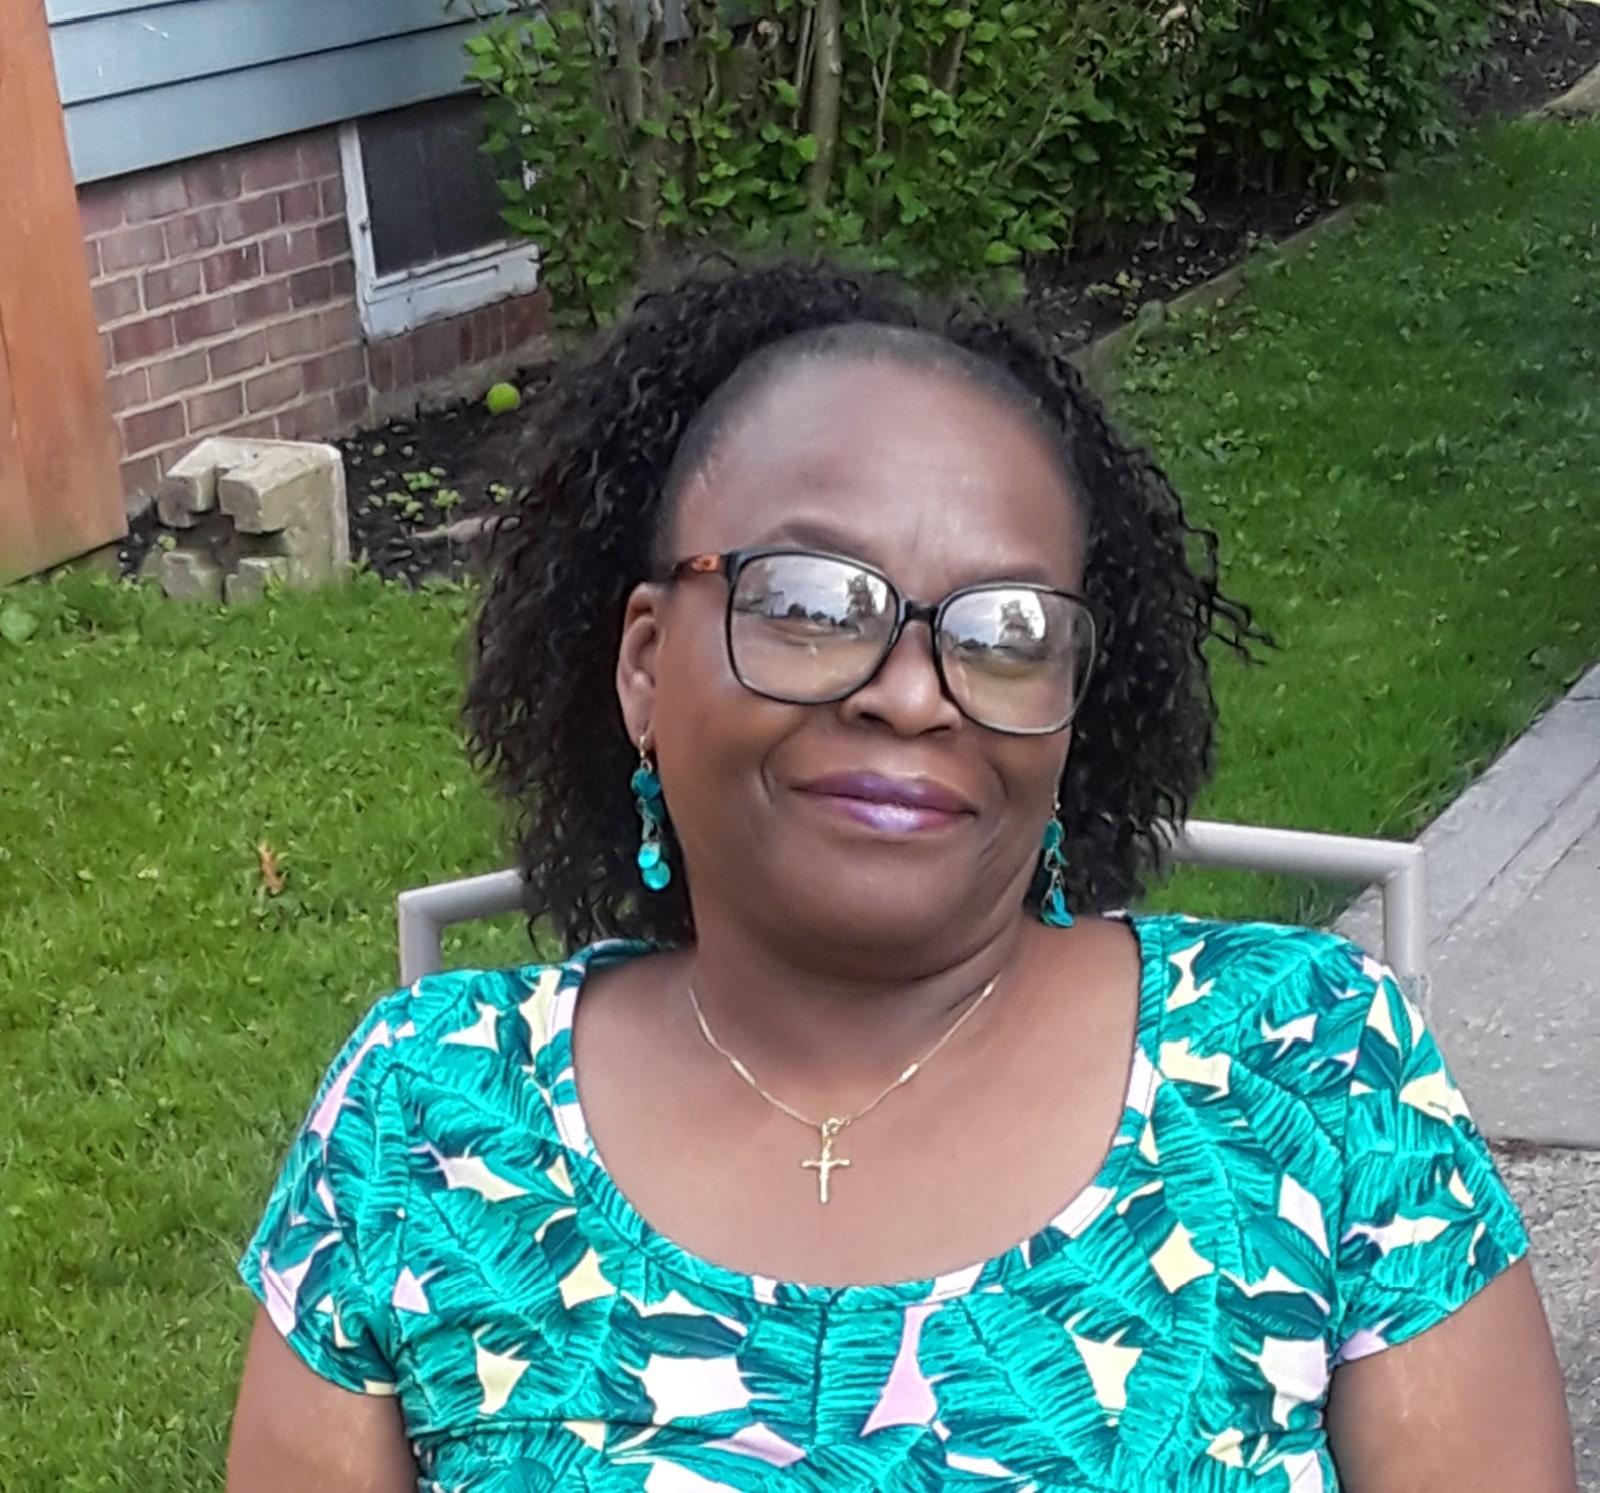 Elderly Care Smyrna GA - EMPLOYEE SPOTLIGHT July 2021